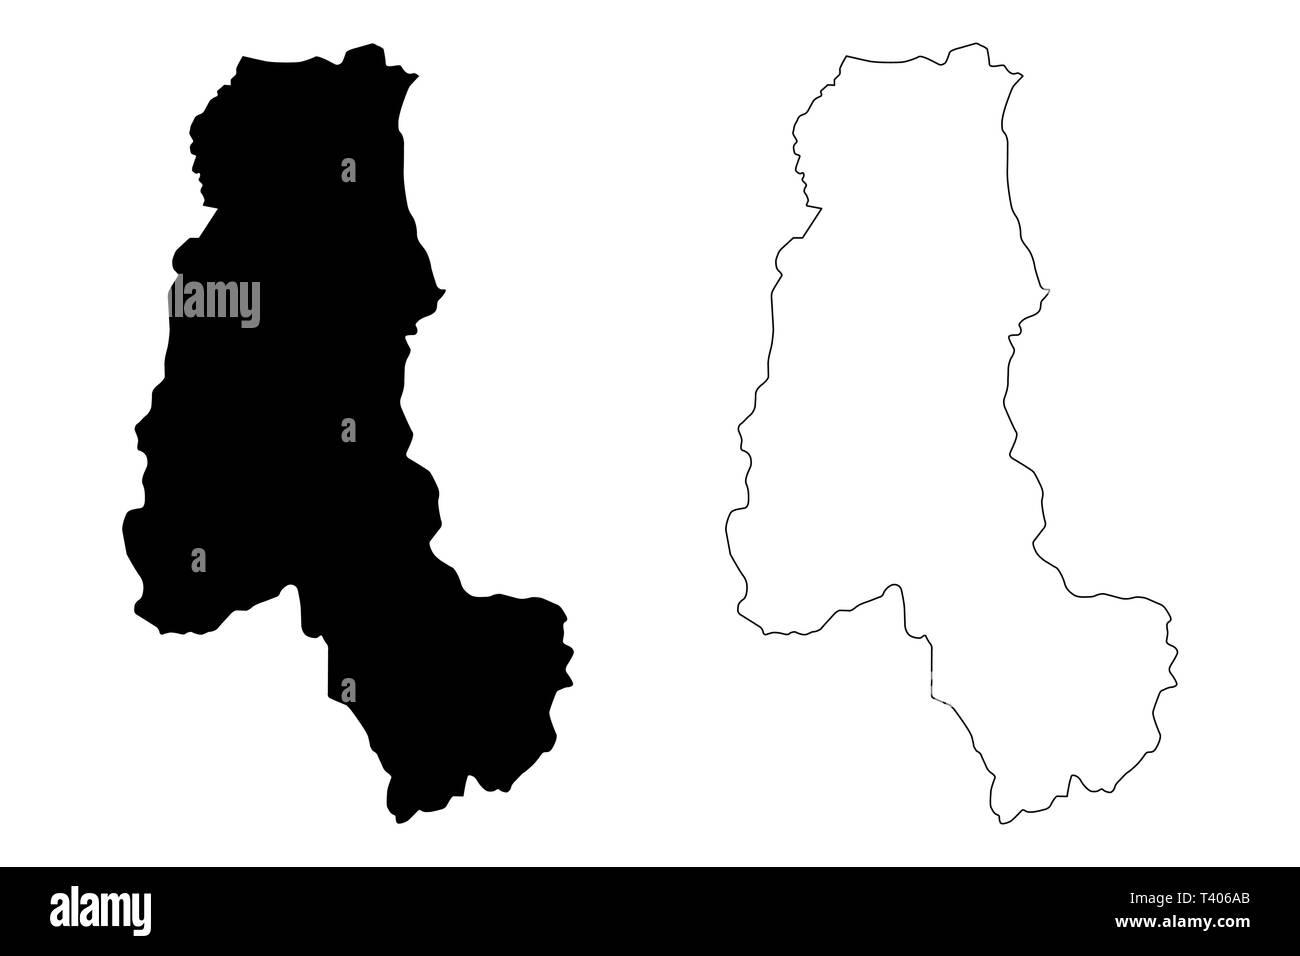 Karte Afghanistan Provinzen.Provinz Takhar Islamische Republik Afghanistan Provinzen